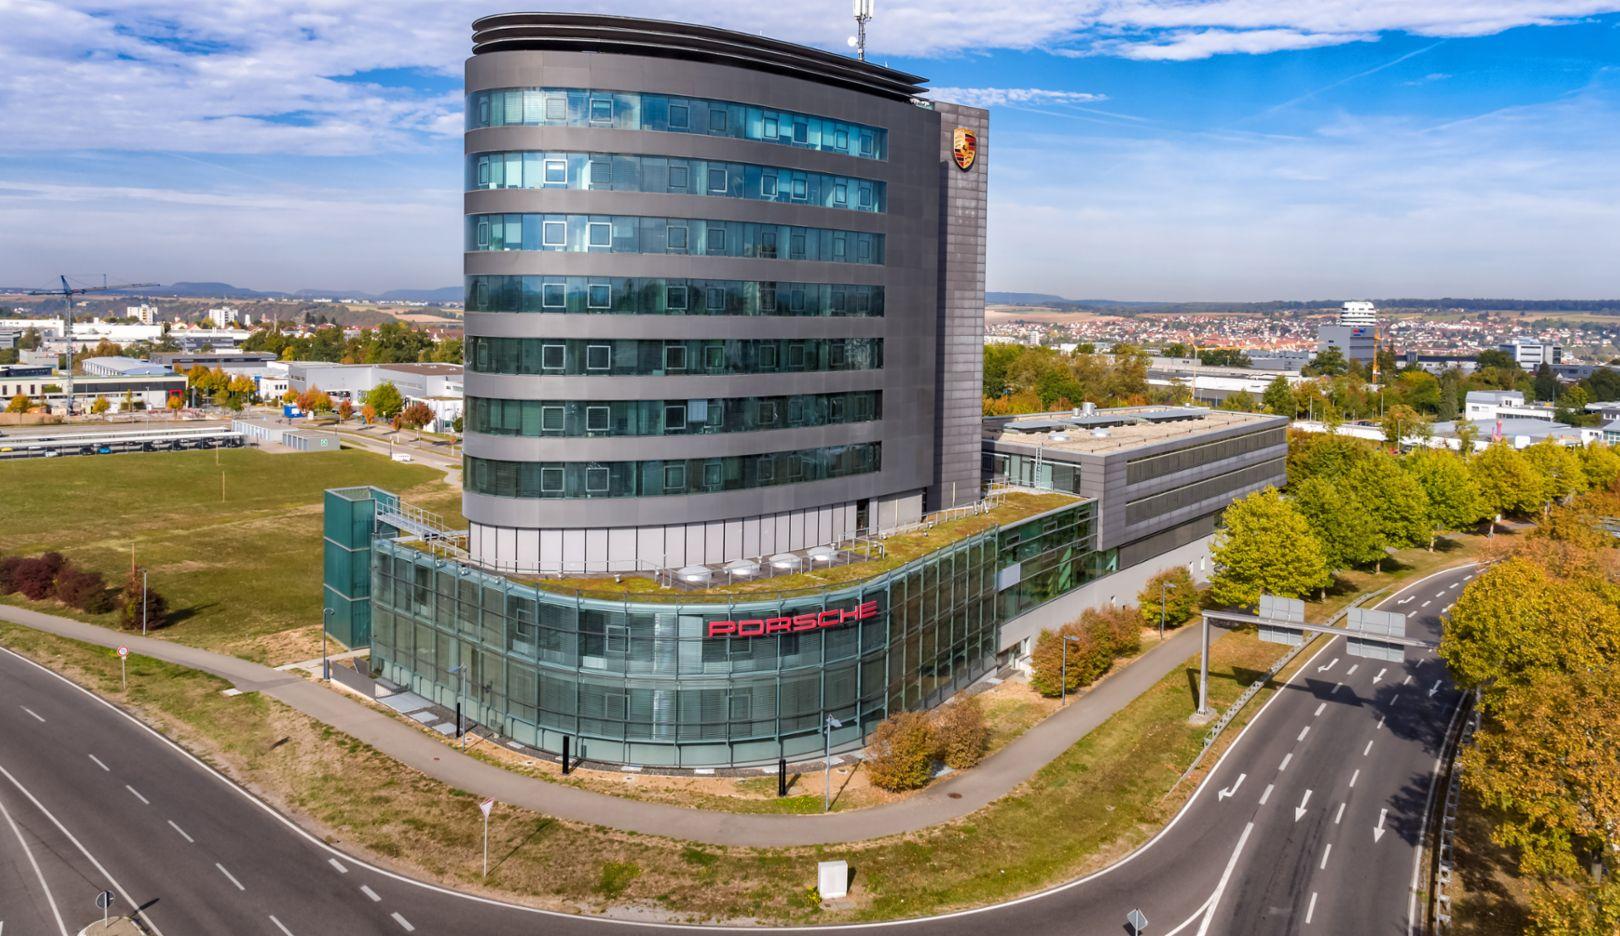 Porsche Financial Services, Bietigheim, 2018, Porsche AG